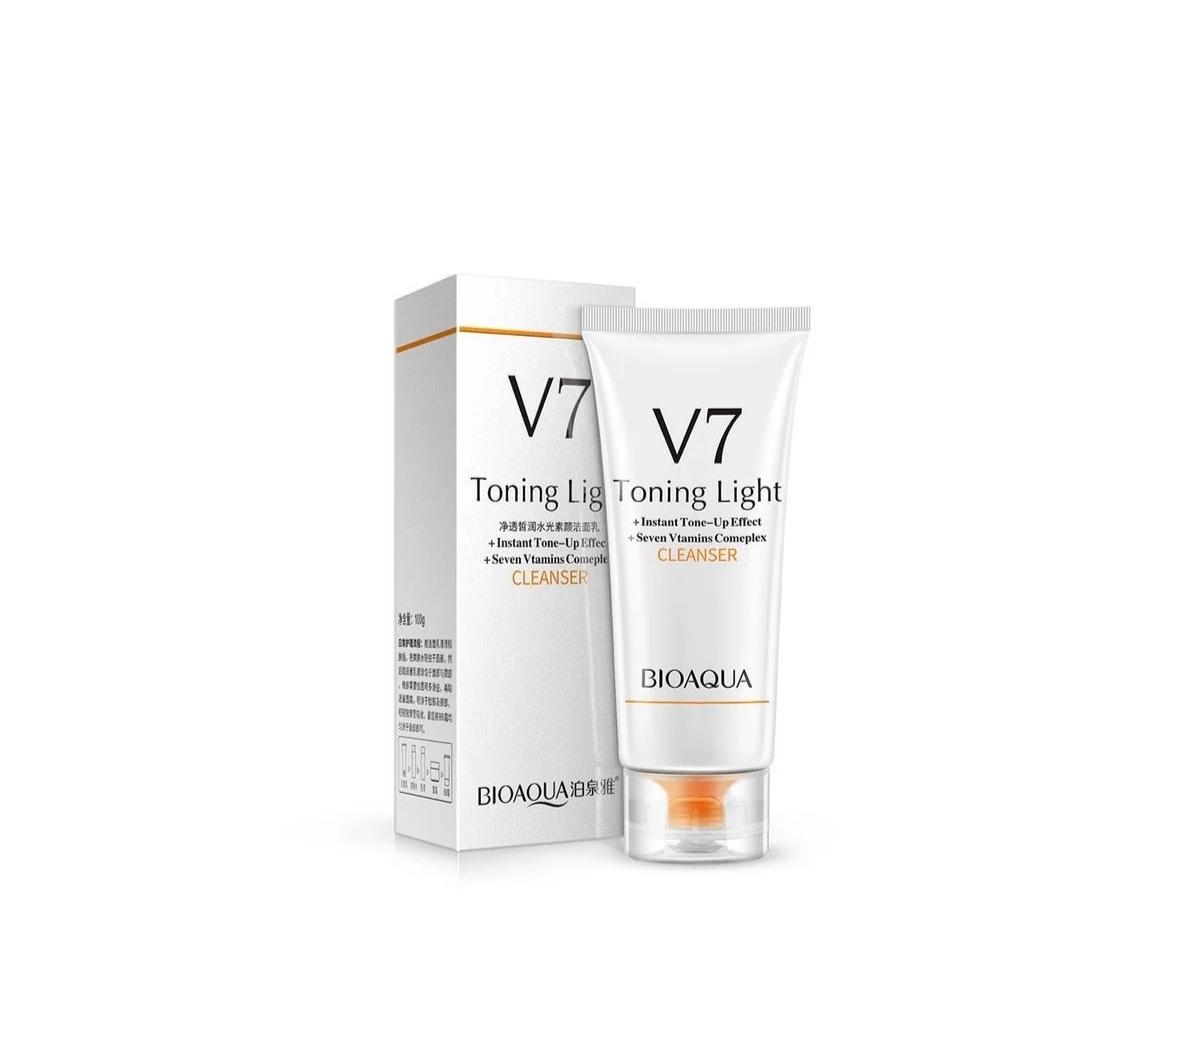 فوم شستشو v7 (هفت ویتامین) بیوآکوا